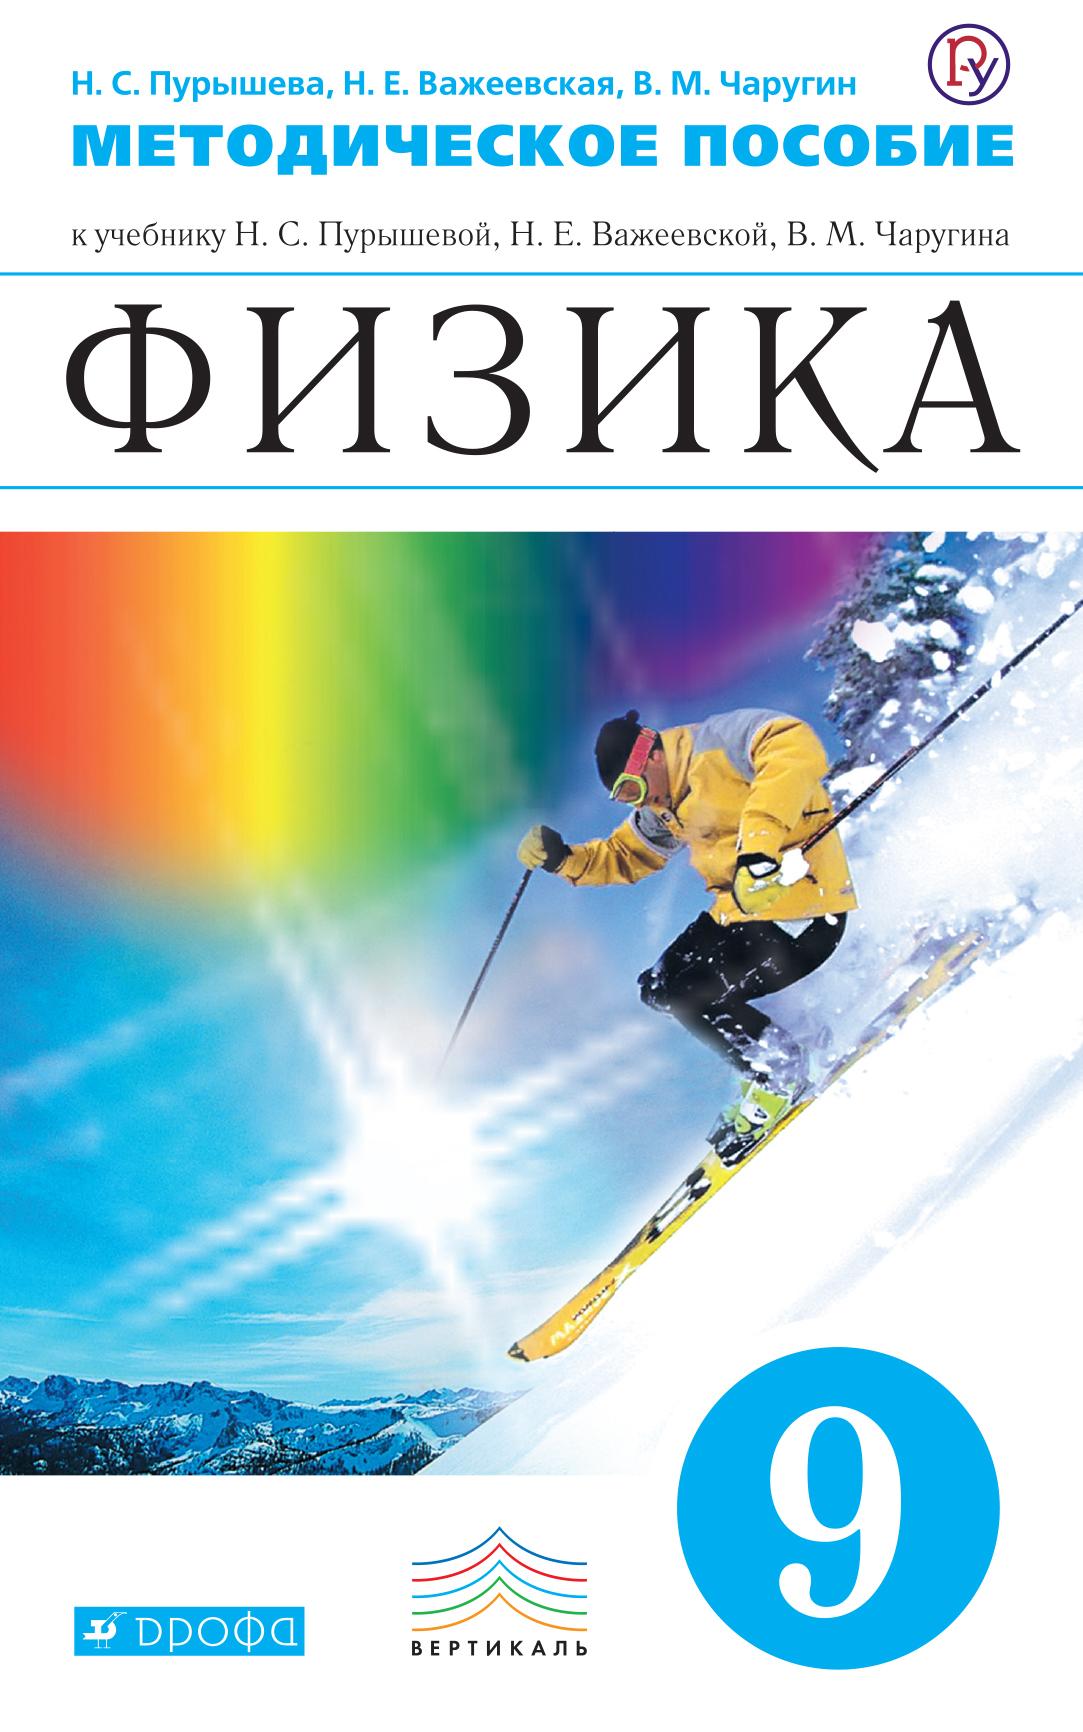 Пурышева Н.С., Важеевская Н.Е., Чаругин В.М. Физика. 9 класс. Методическое пособие физика 9 класс